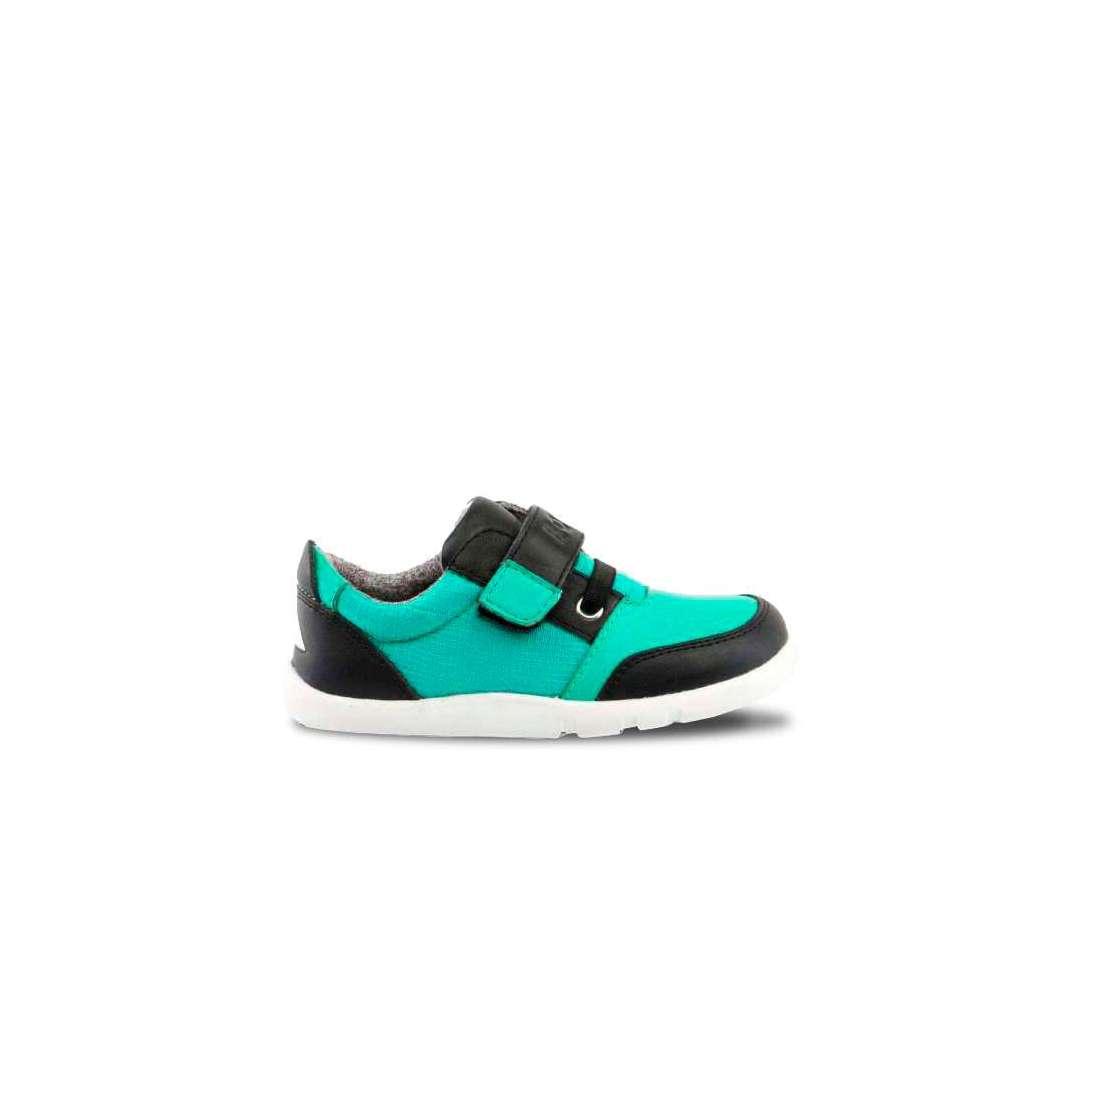 Shoes minimalist kids bobux deca for Minimalist house slippers